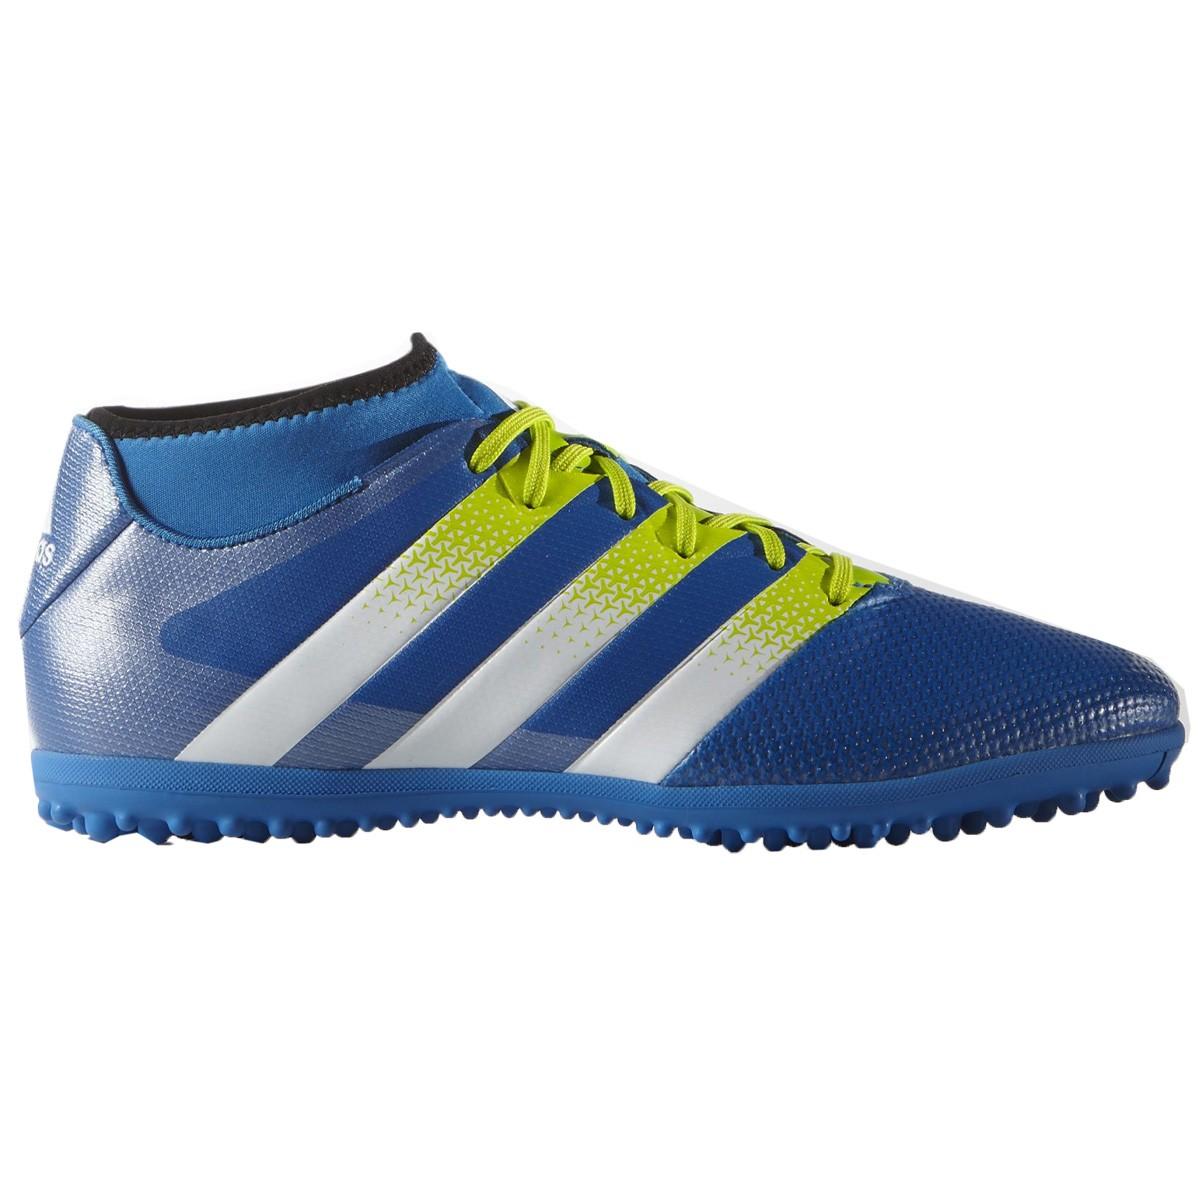 Chuteira F7 Adidas Ace 16.3 Primemesh TF AQ2564 Azul Verde 6d97a44c3402d